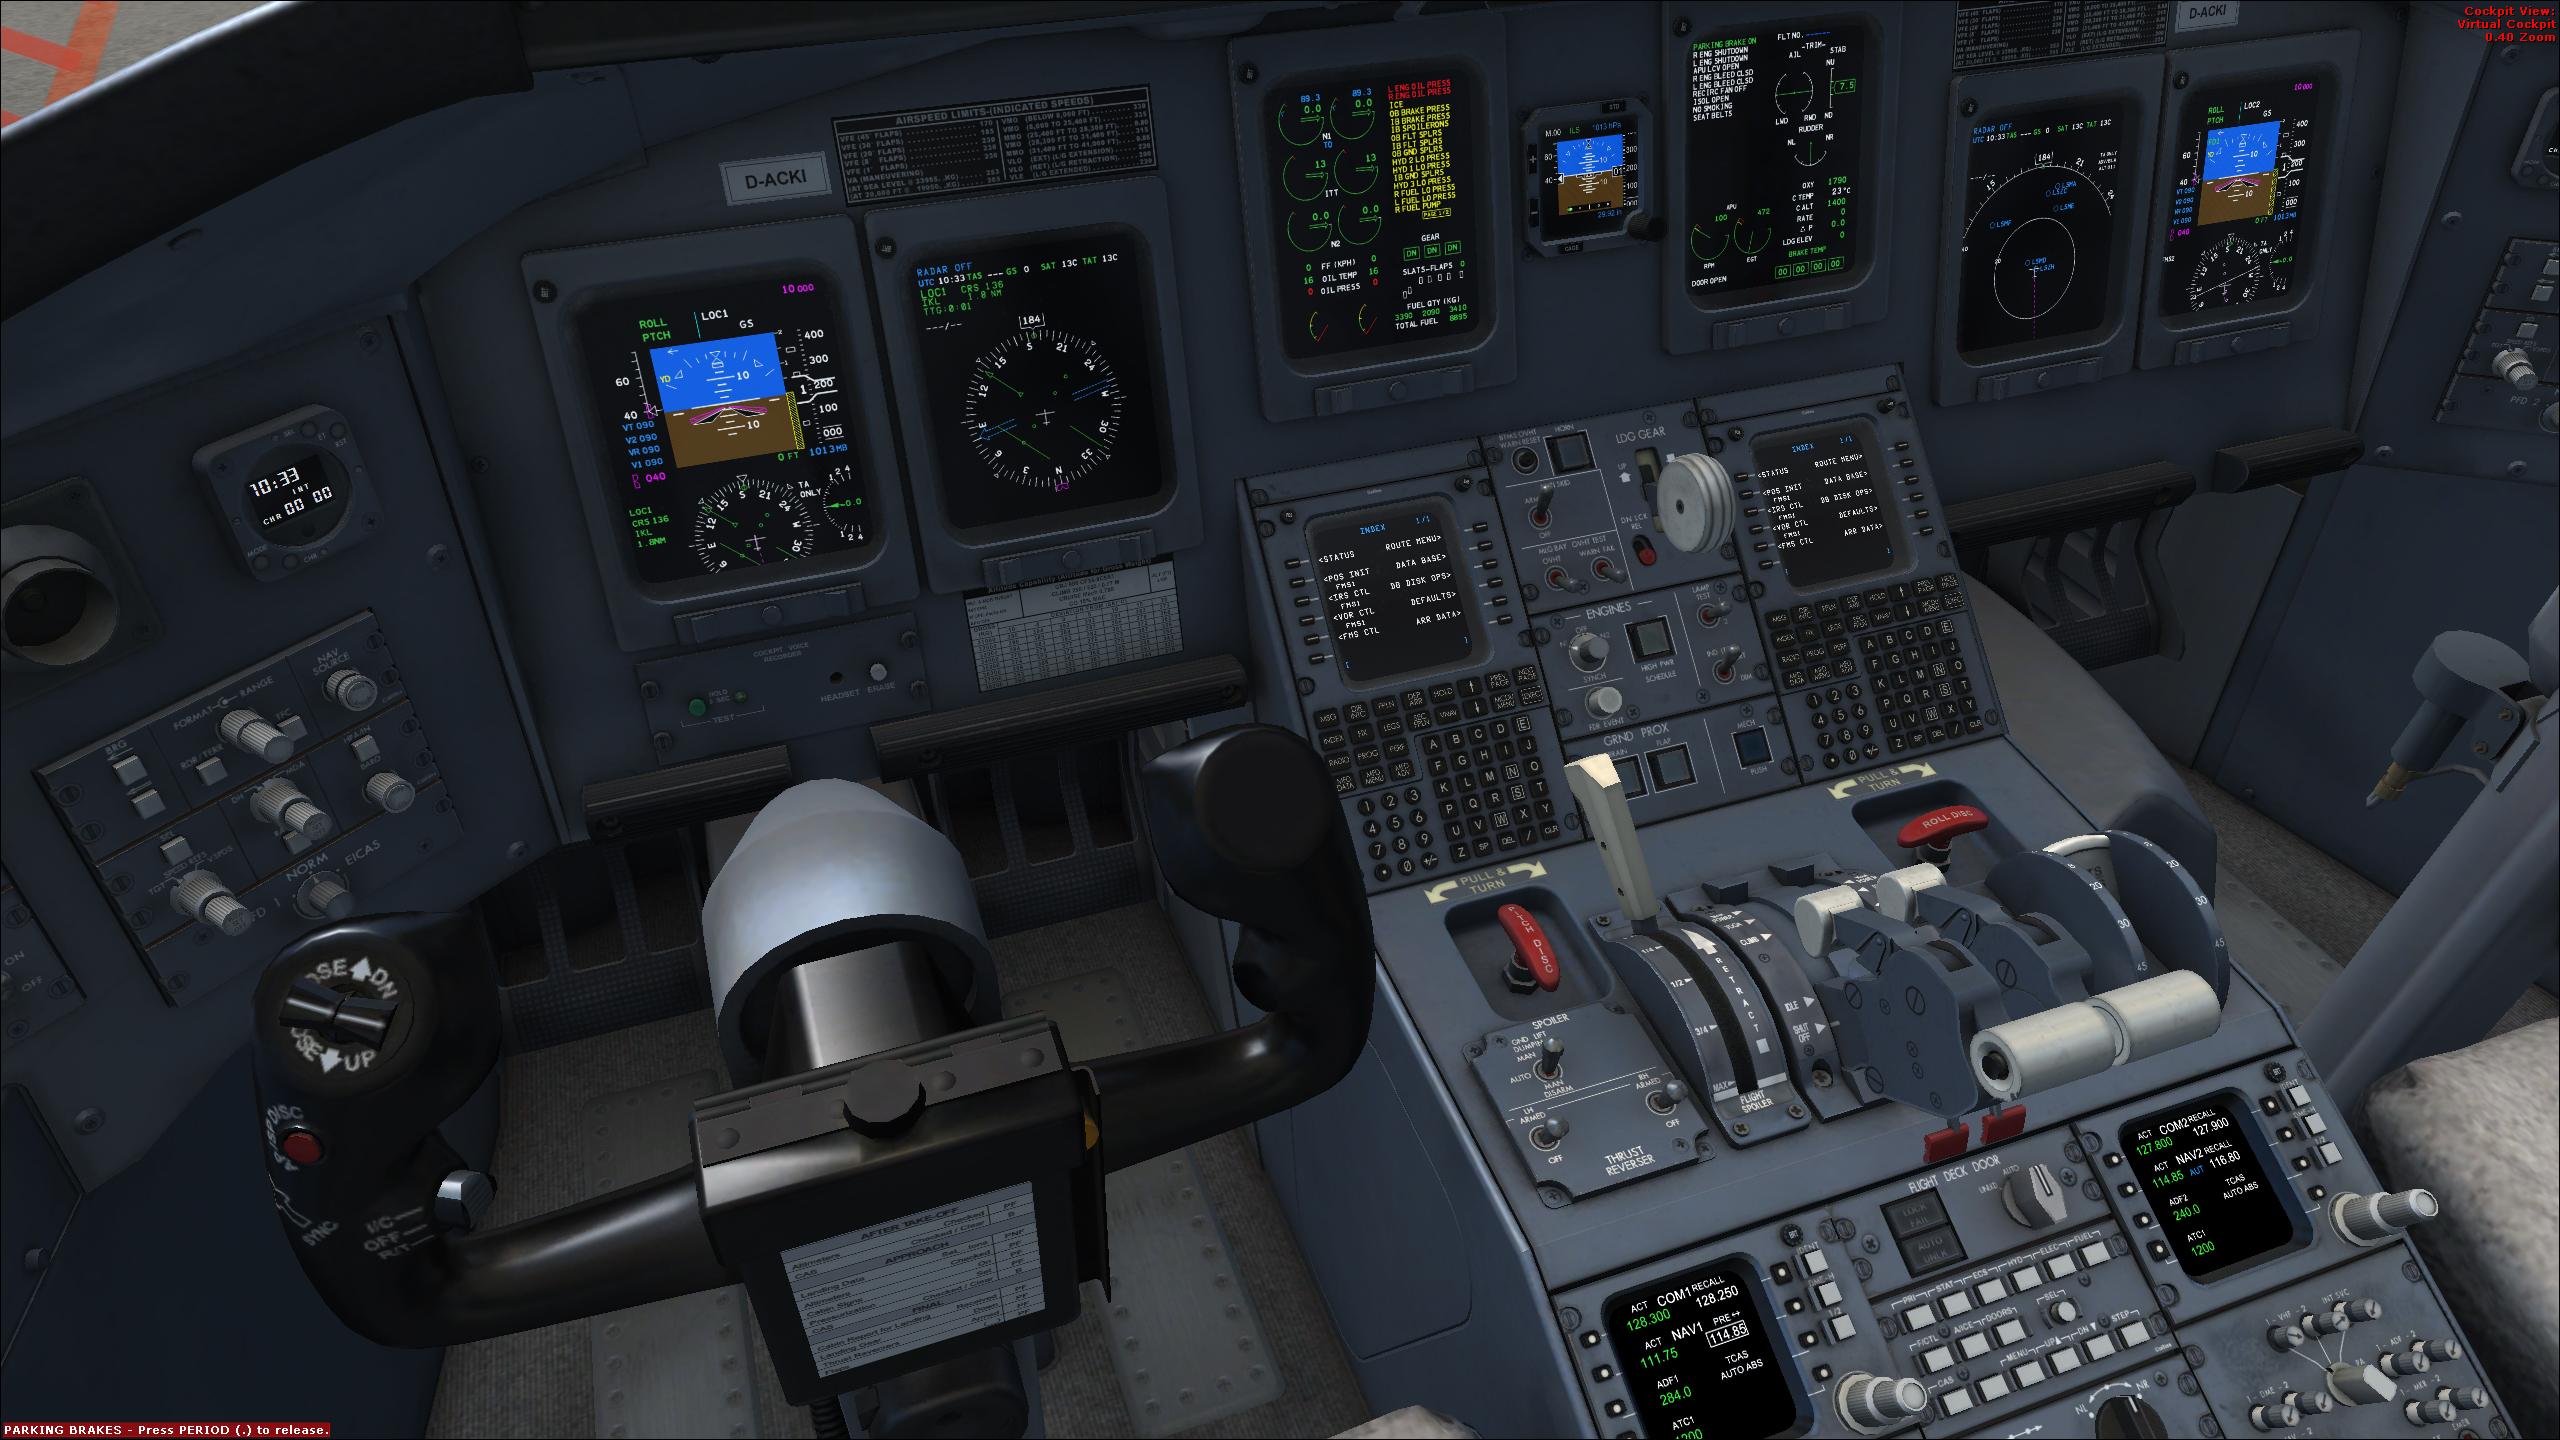 CRJ not reacting on ILS - Manual Flight, Autoflight and